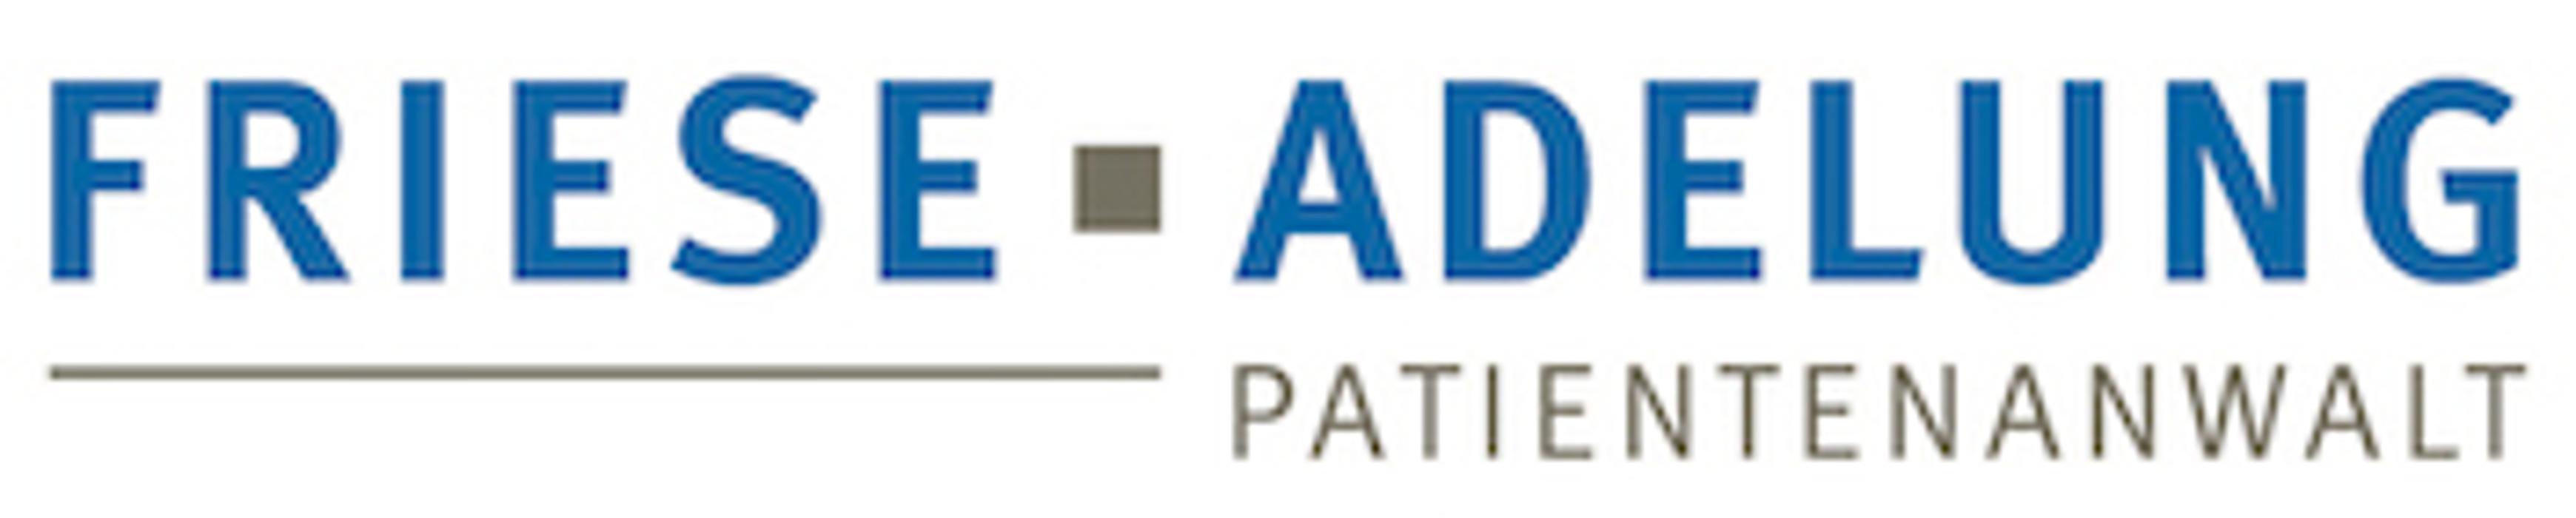 Patientenanwalt - Rechtsanwälte Friese und Adelung Partnerschaft mbB